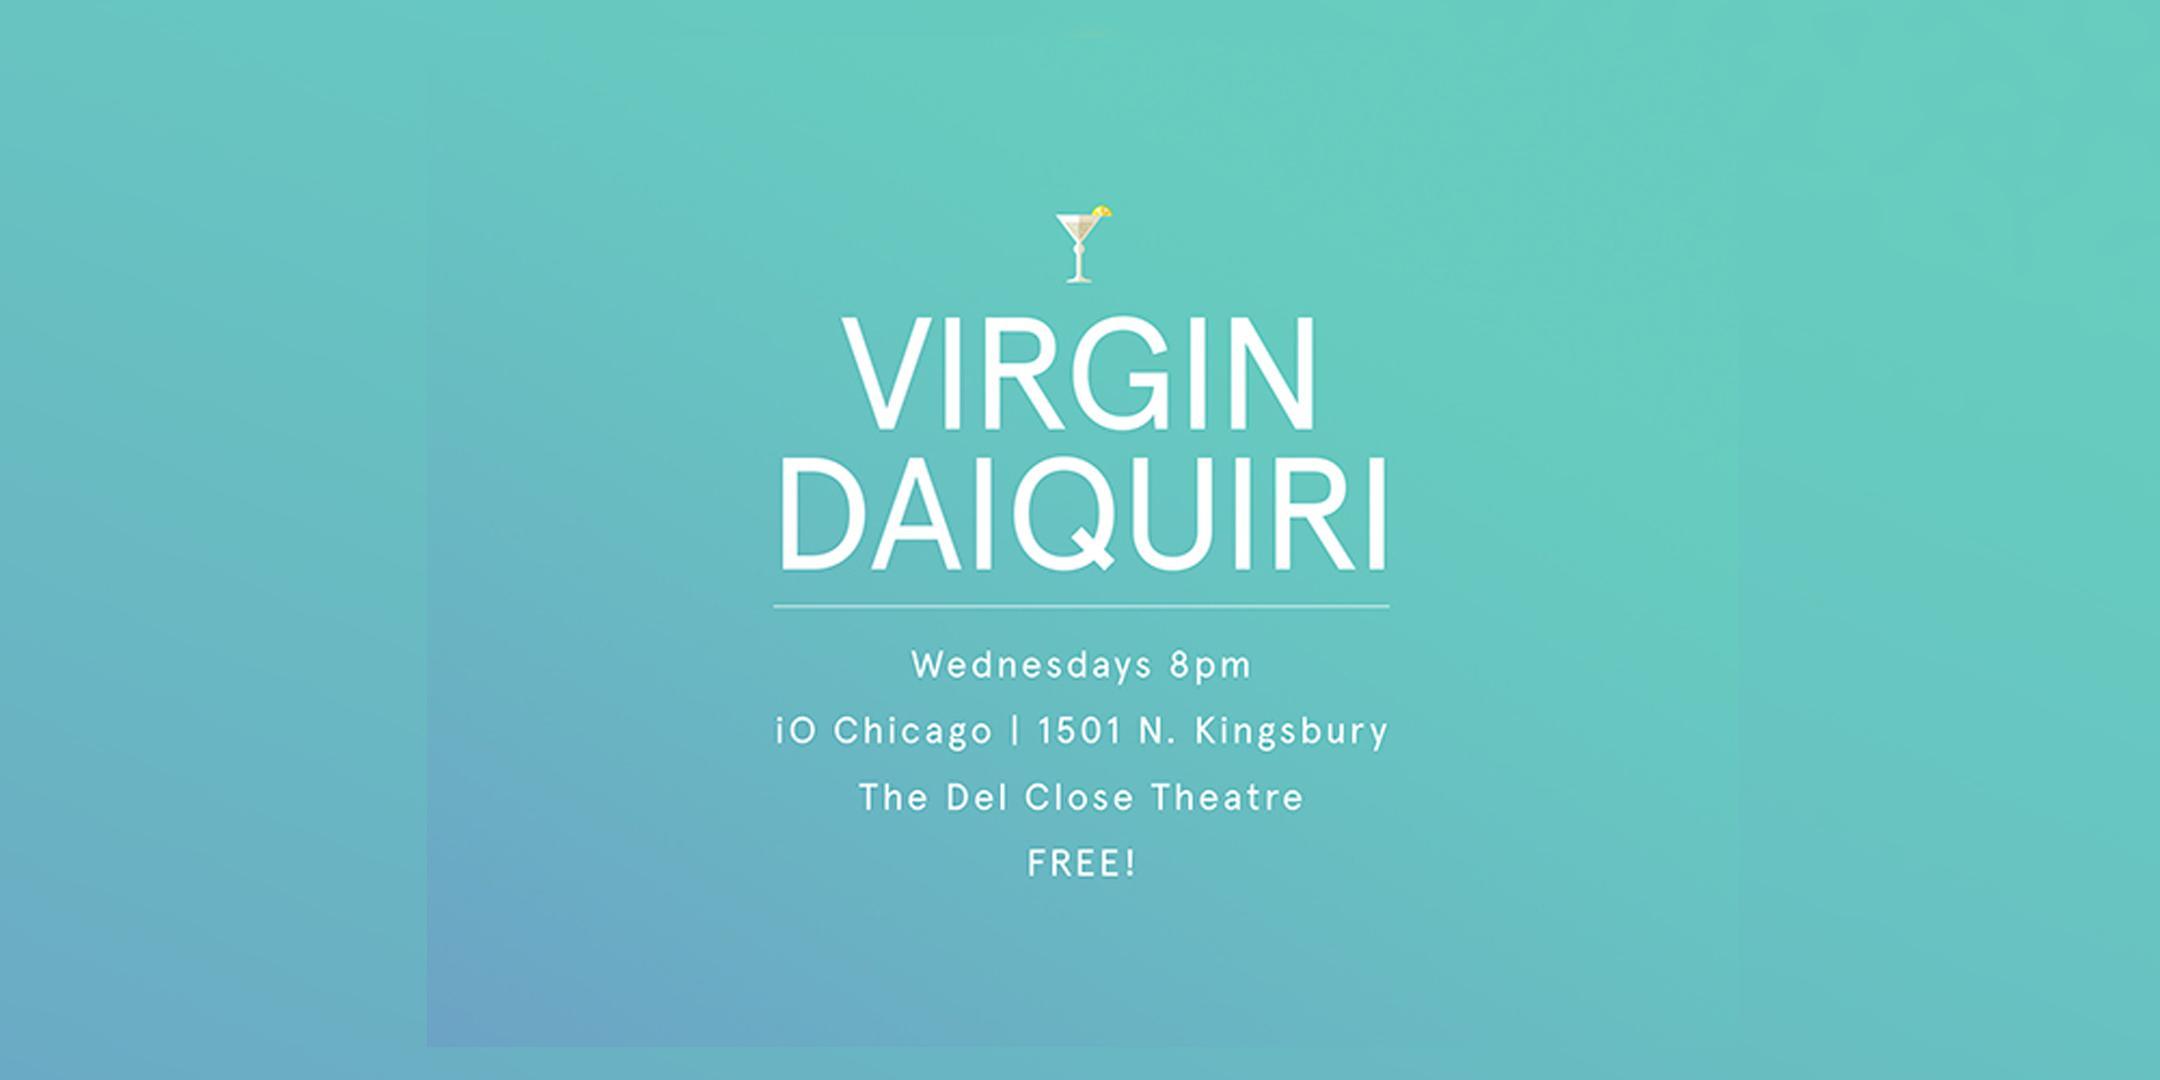 Virgin Daiquiri, The Harold Team Gone Gone